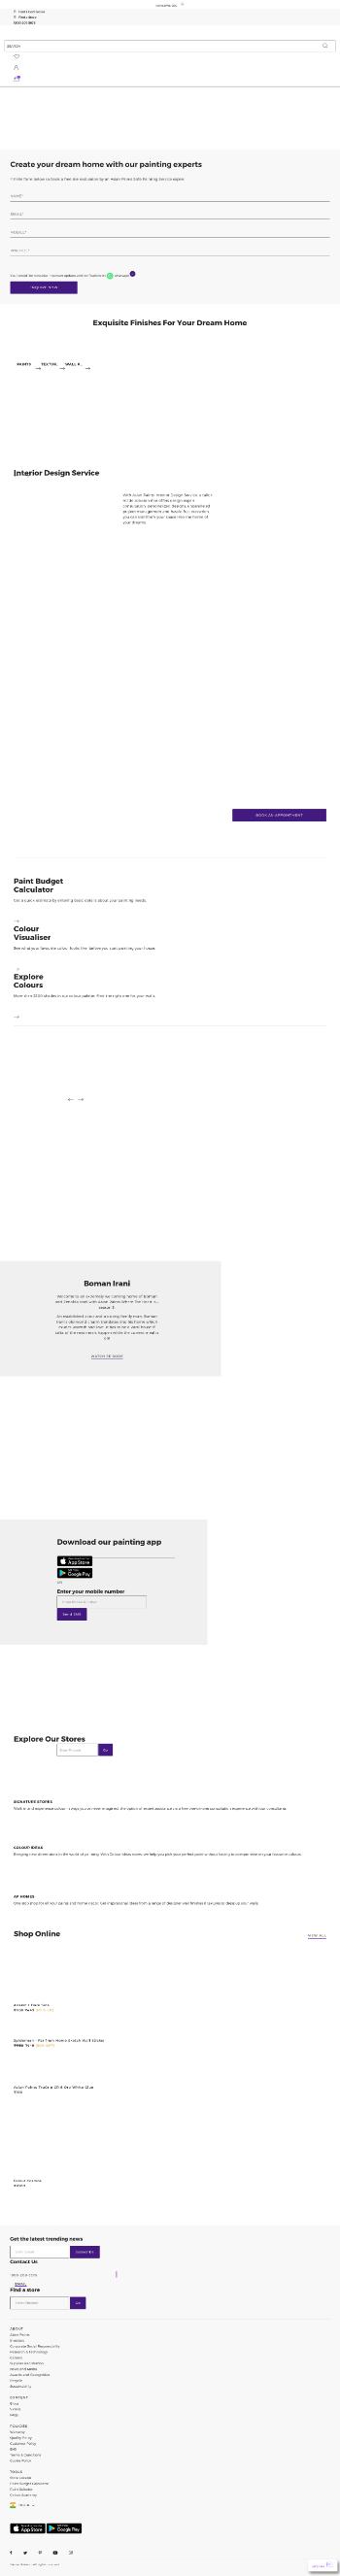 Asian Paints Limited Website Screenshot